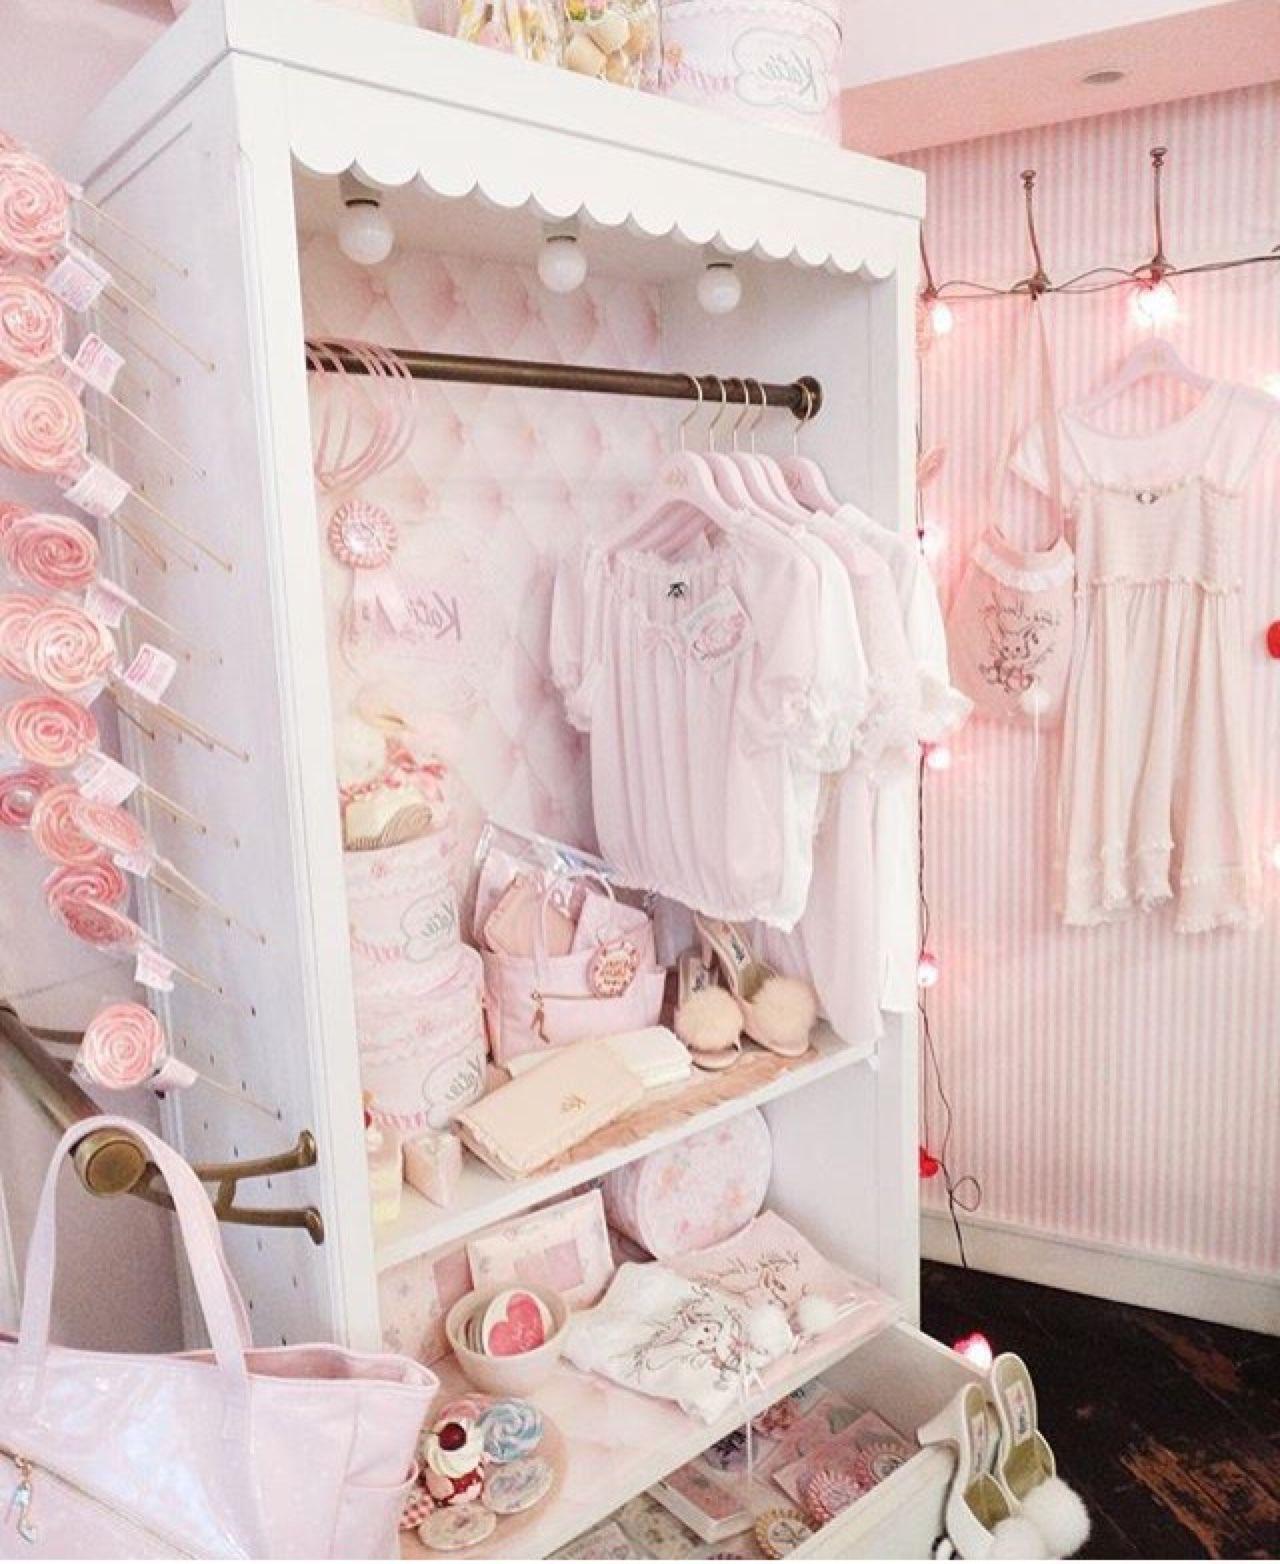 Cute Girly Closet Wallpaper Iphone Best Iphone Wallpaper Kawaii Bedroom Girly Room Kawaii Room